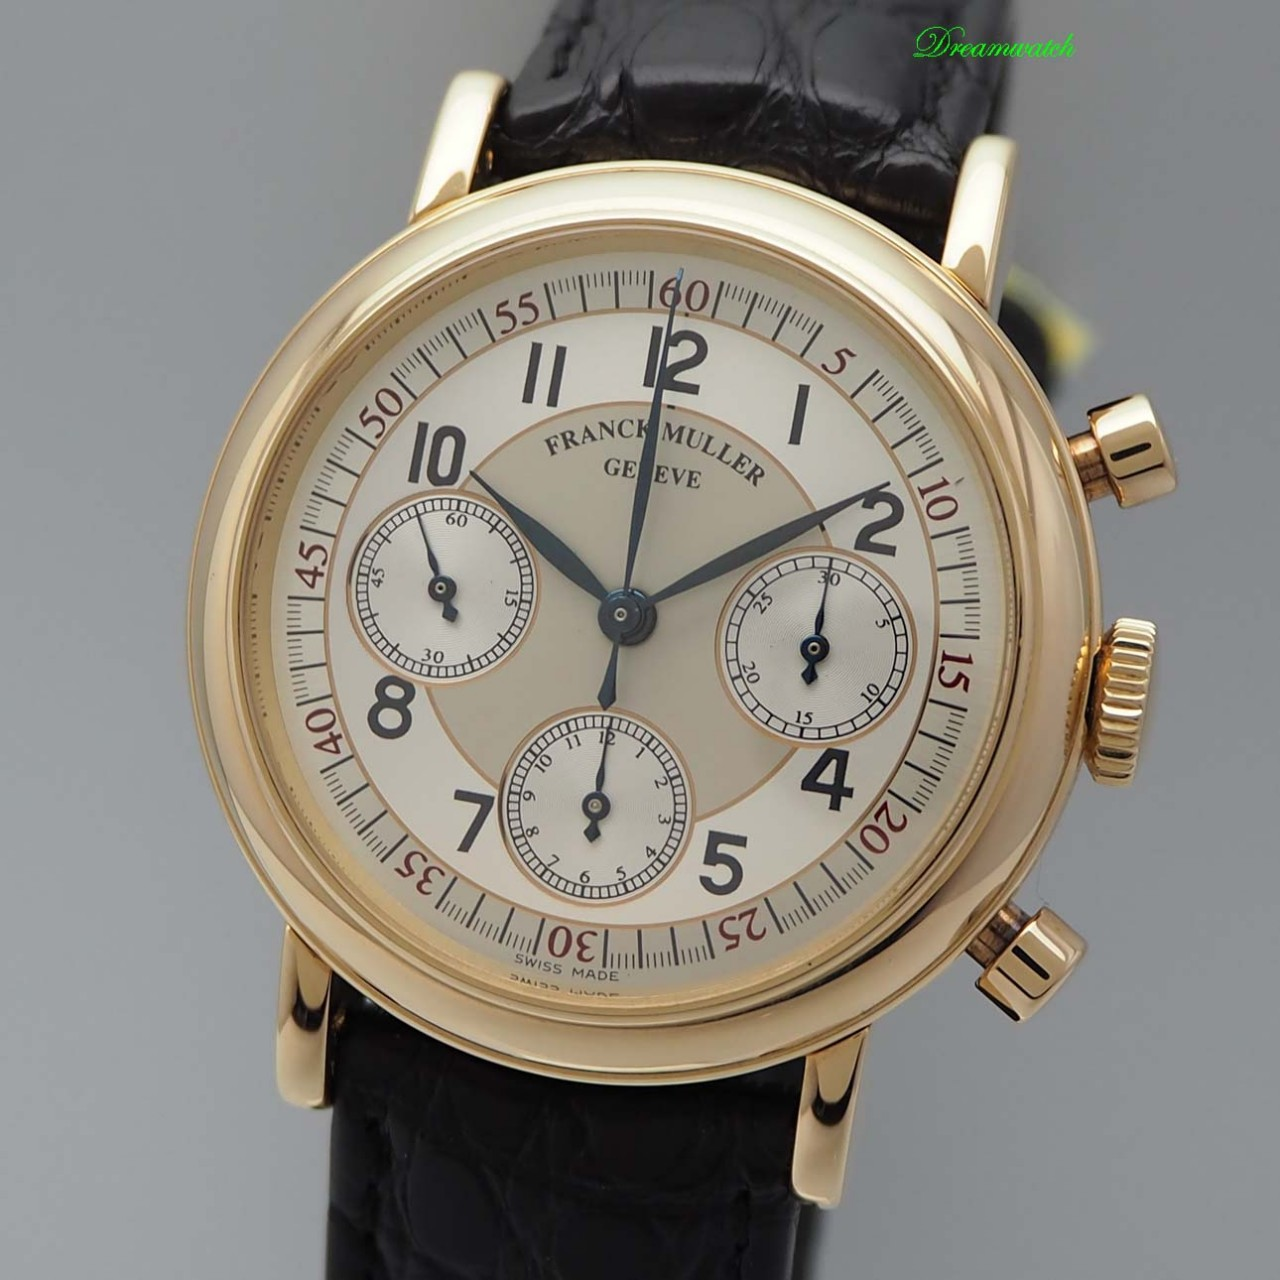 Franck Muller Chronographe Valjoux 726 Ref.: 7200, Gold 18k/750 Handaufzug